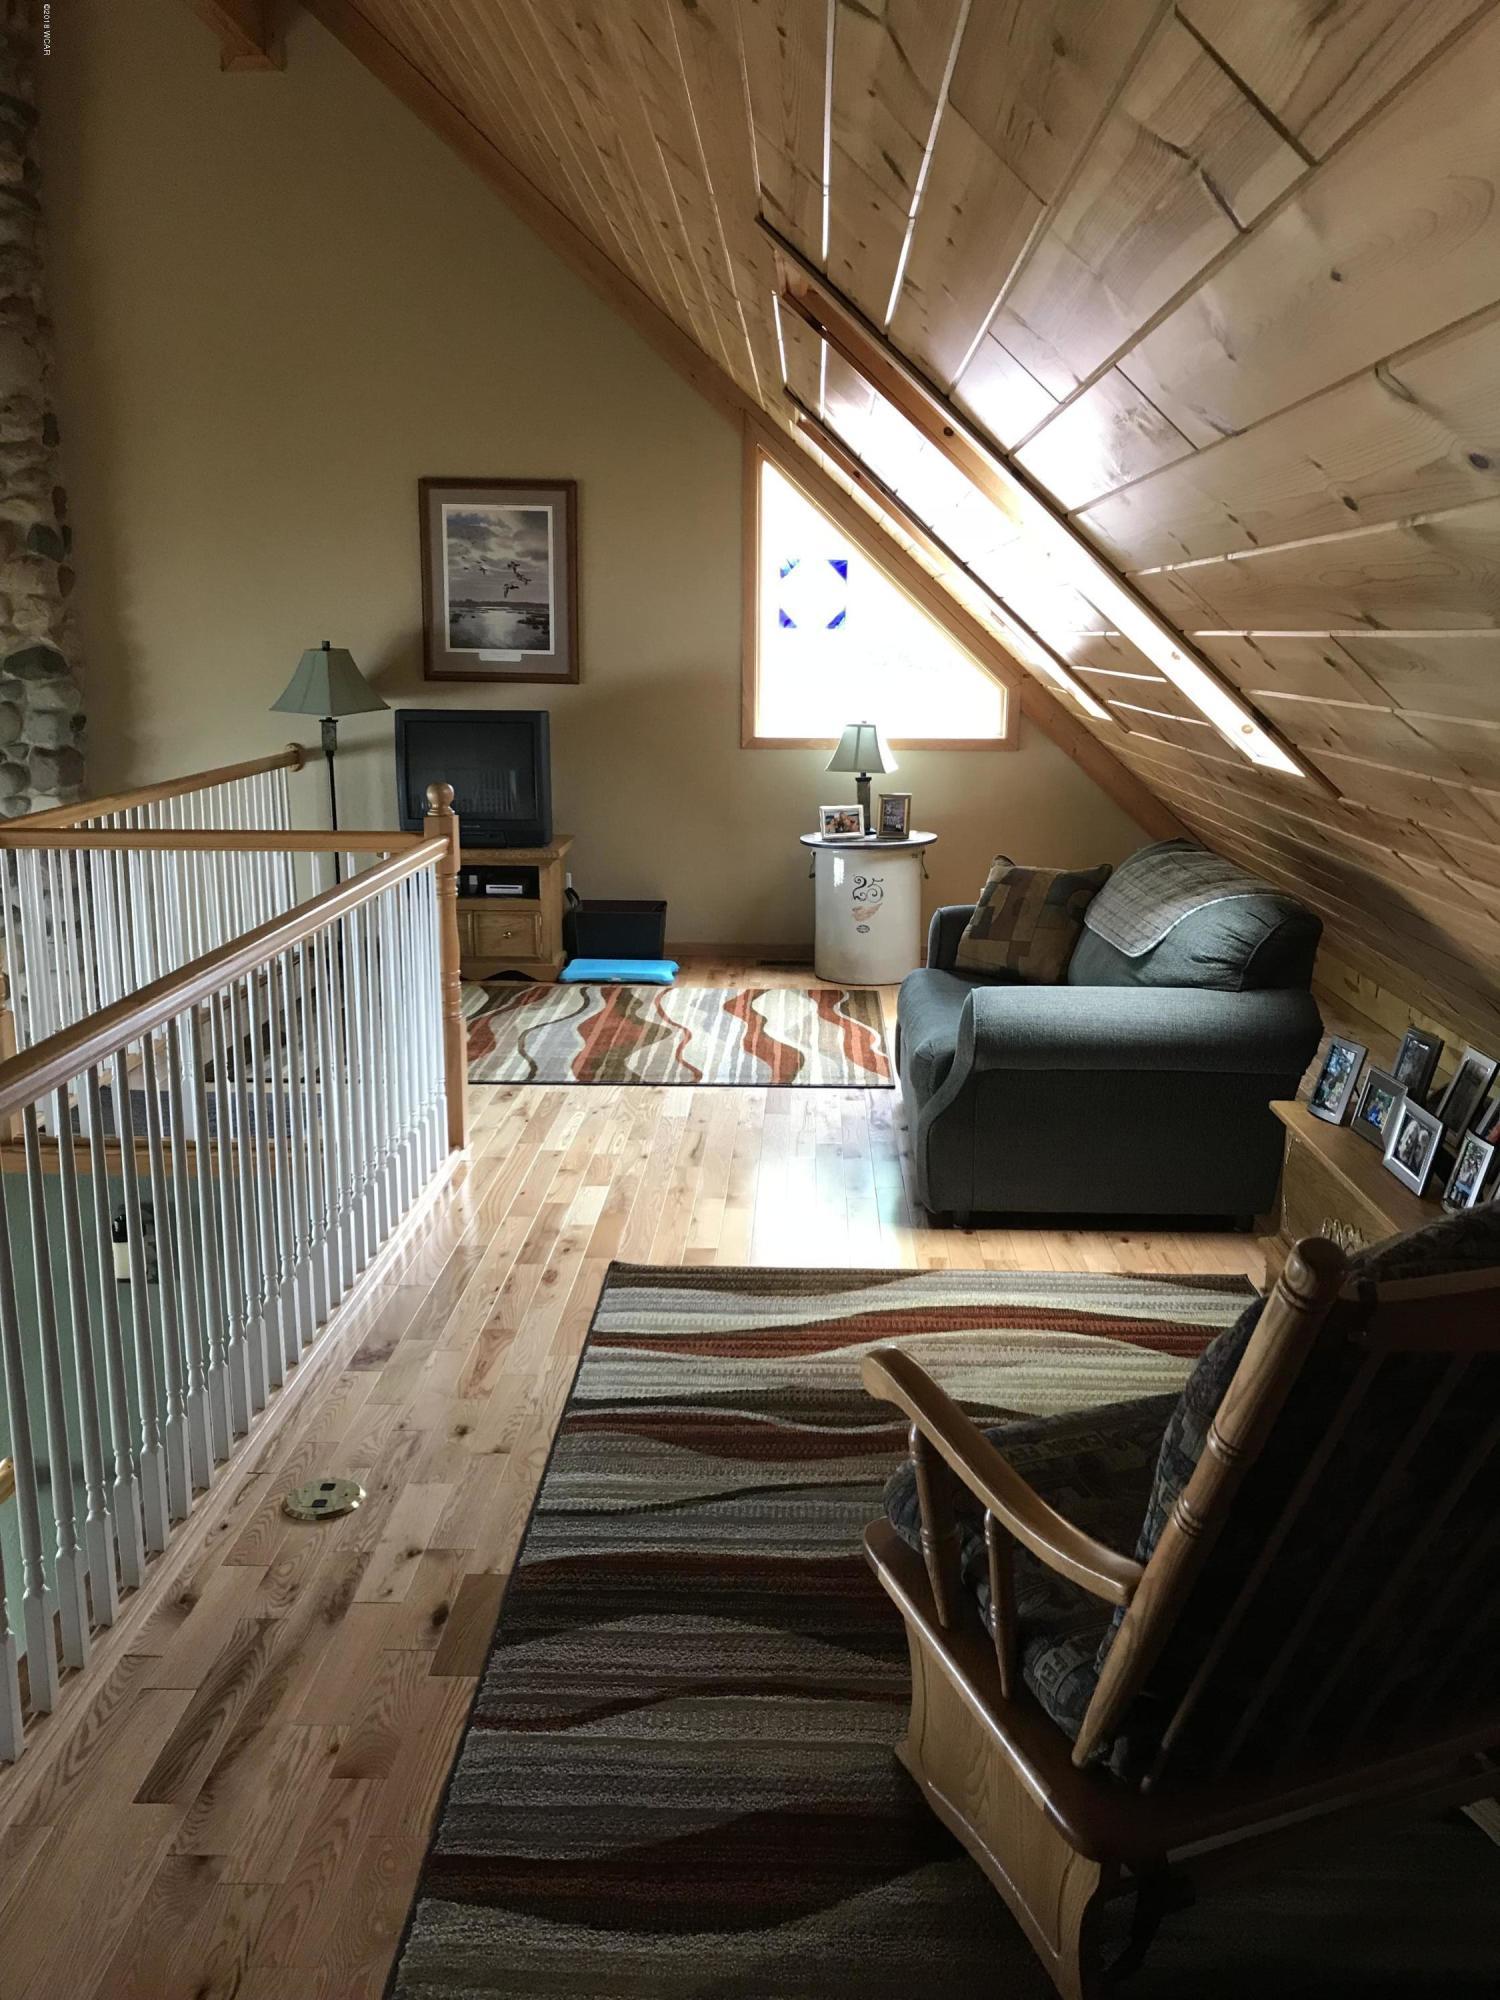 5596 E Eagle Lake Road,Willmar,3 Bedrooms Bedrooms,3 BathroomsBathrooms,Single Family,E Eagle Lake Road,6032333